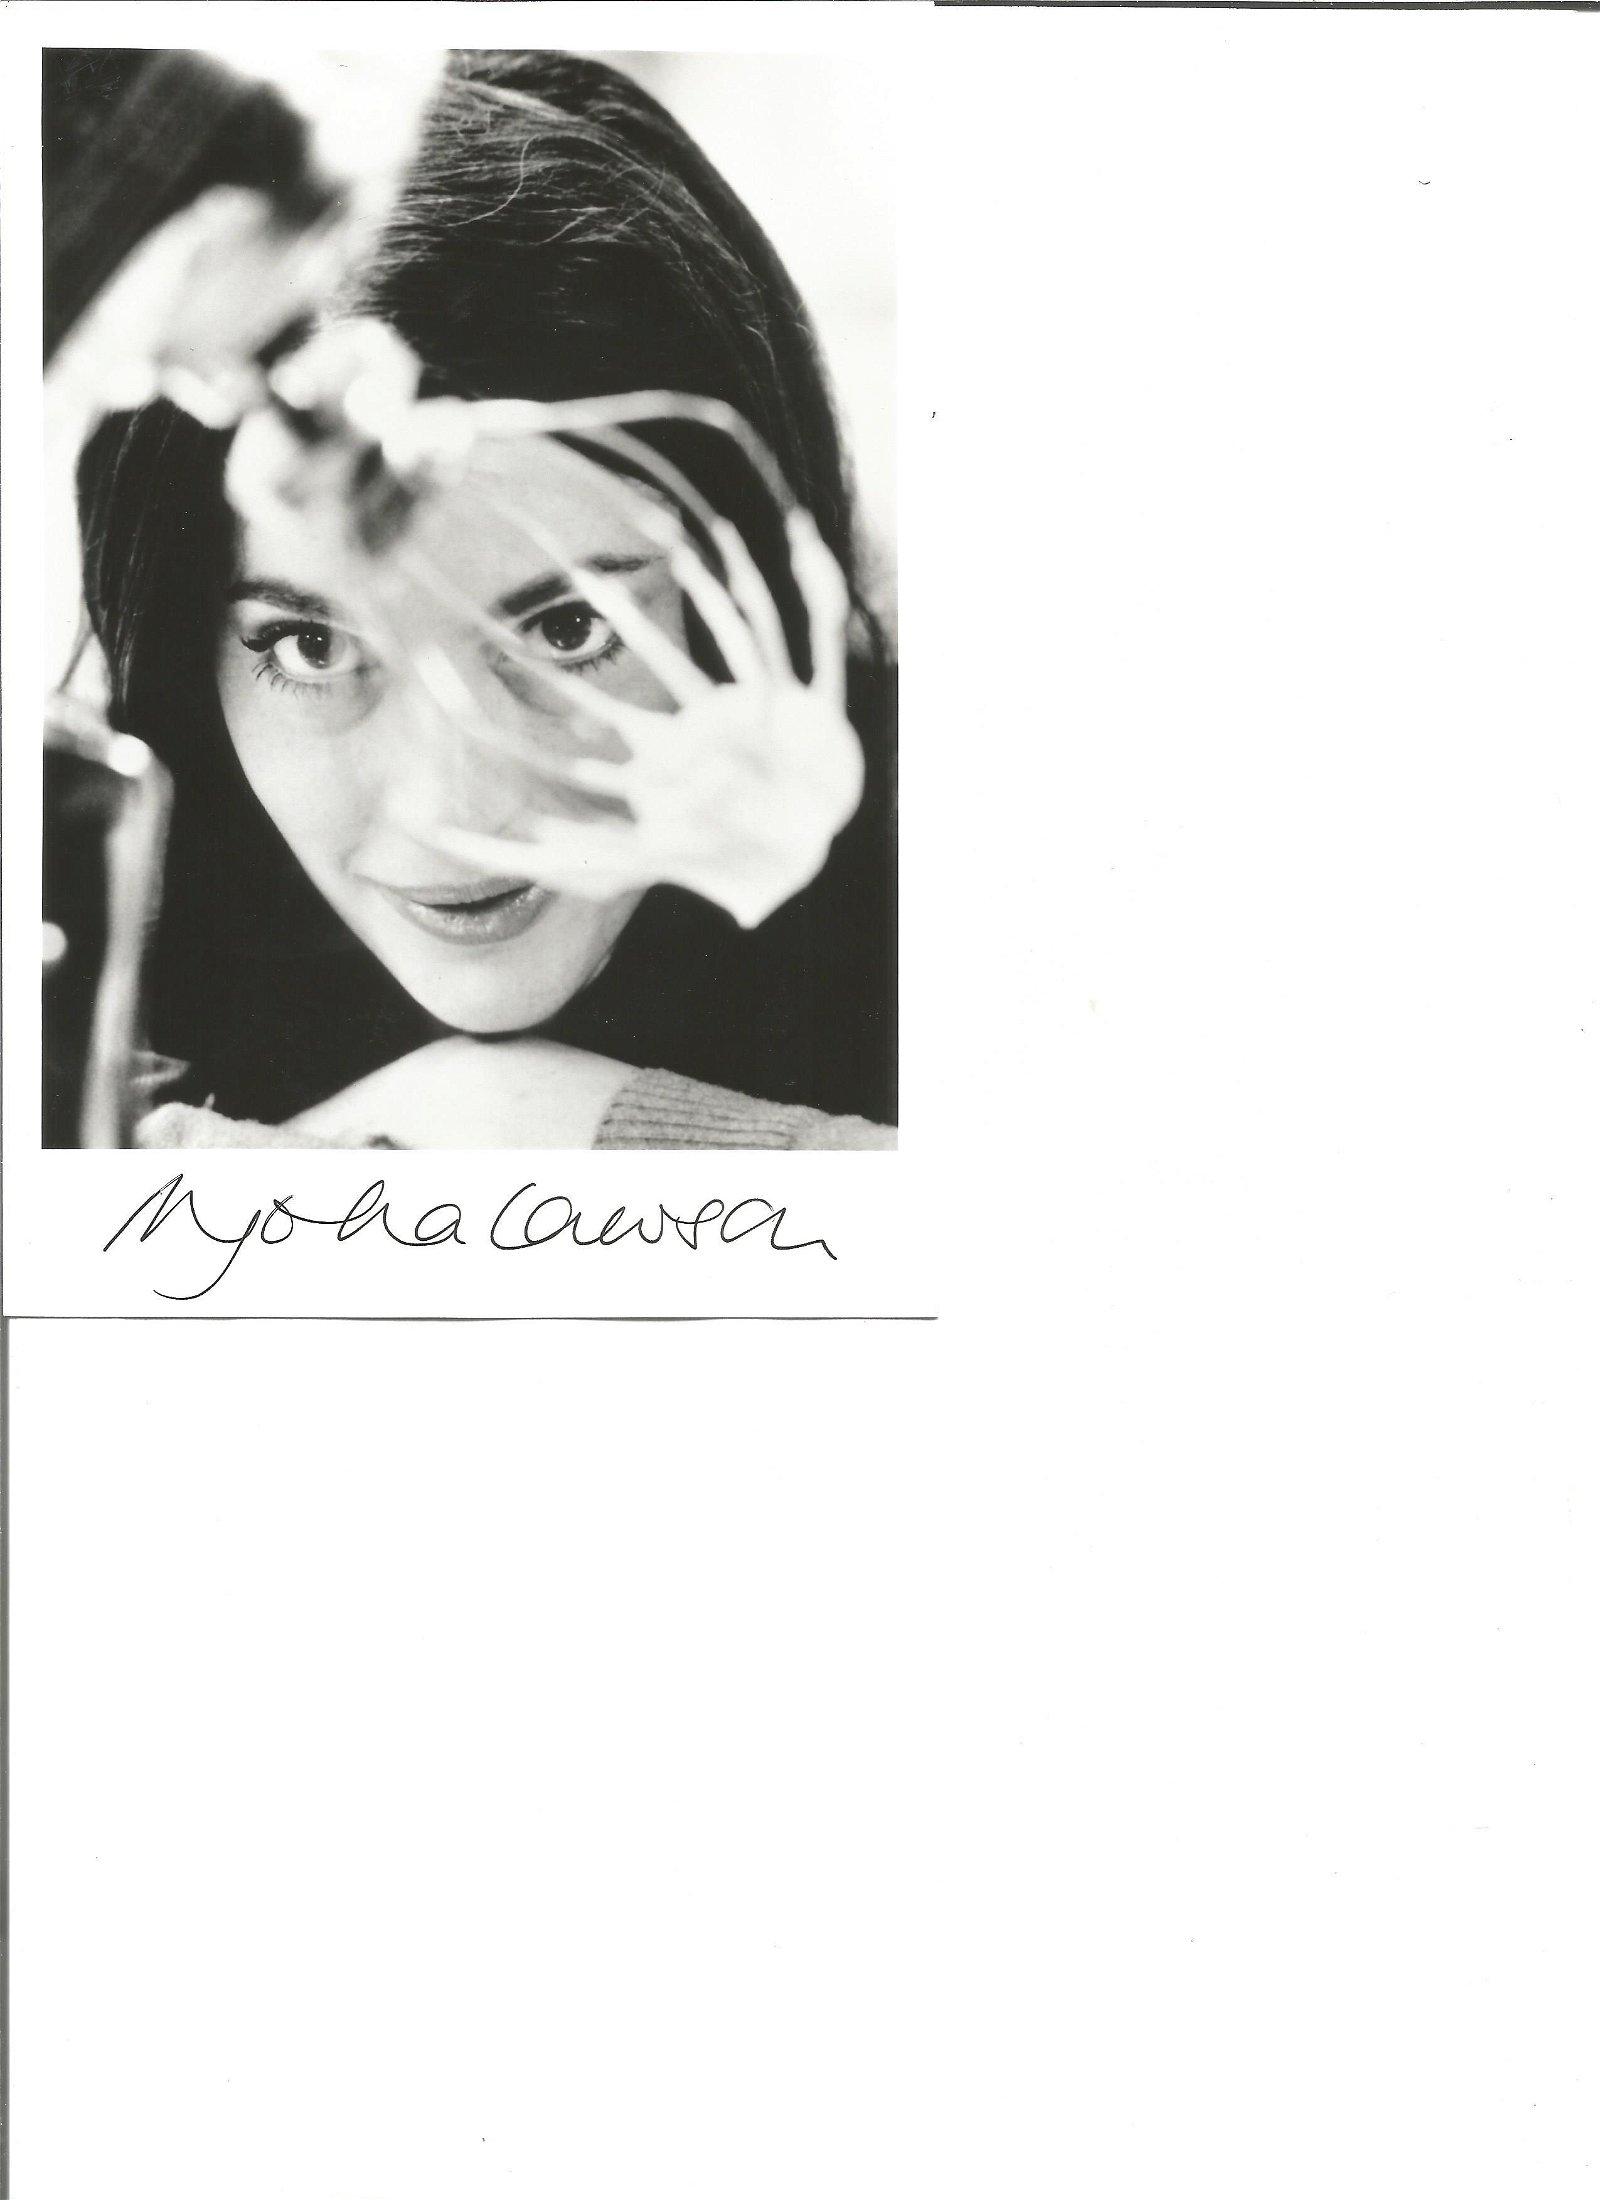 Nigella Lawson signed 7x5 black and white photo. Good